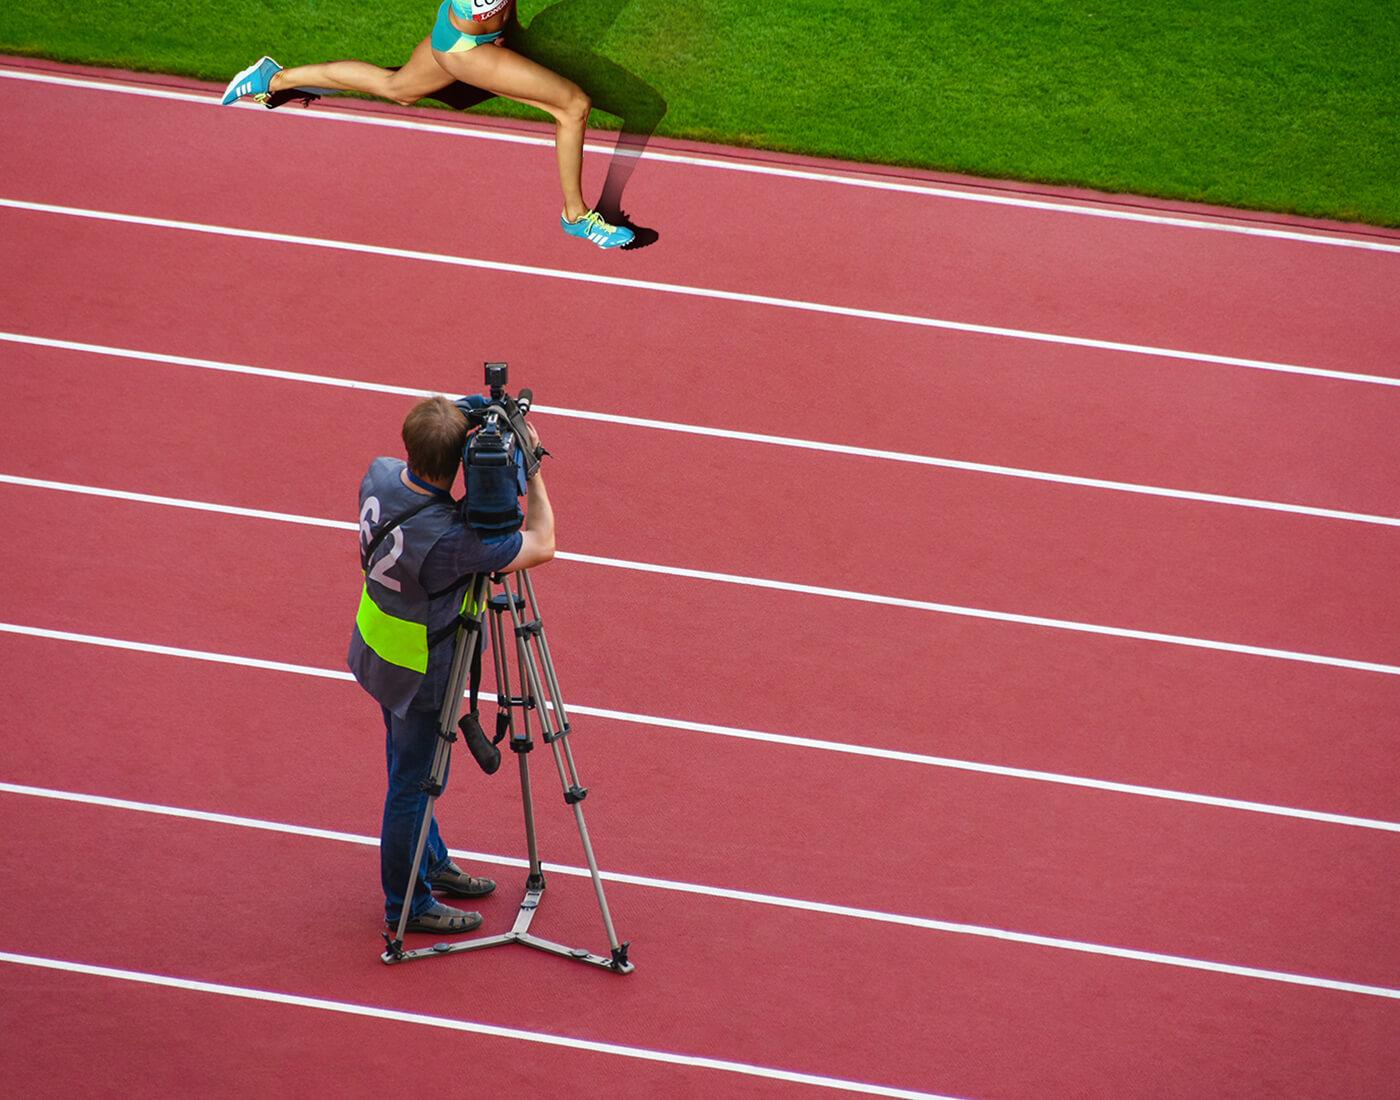 Sports Photographer / Videographer